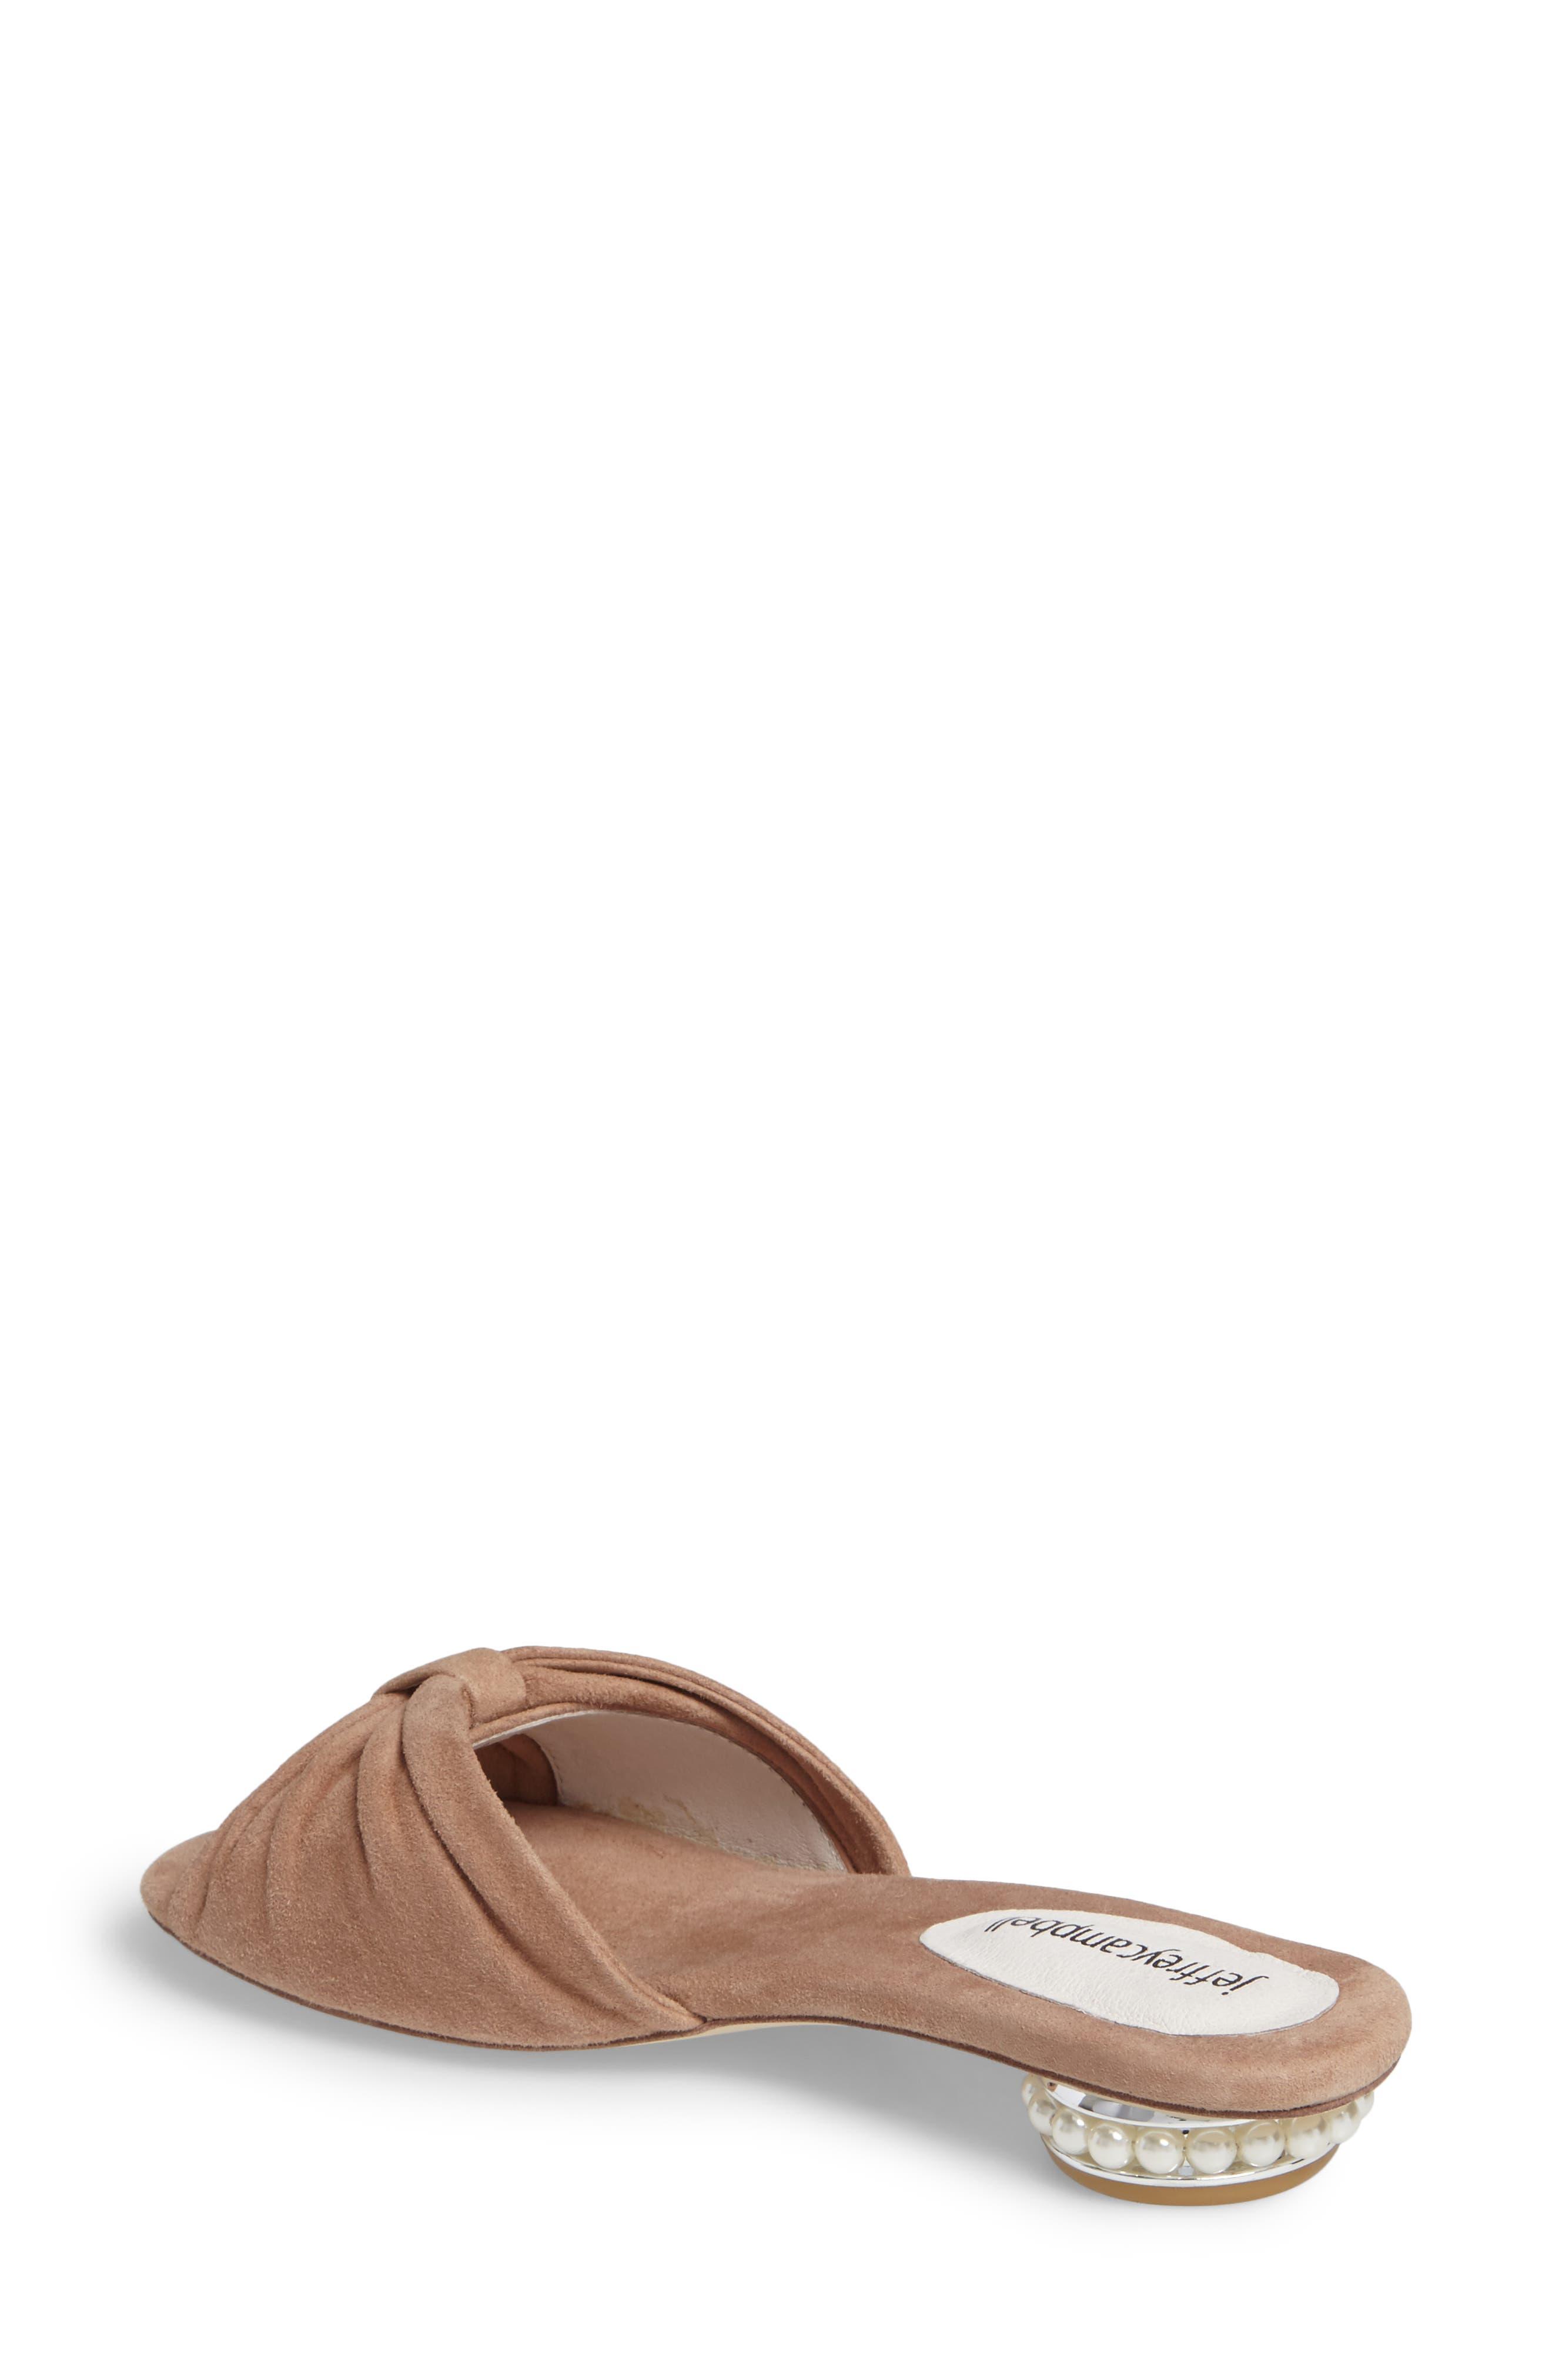 Alternate Image 2  - Jeffrey Campbell Turbina Embellished Slide Sandal (Women)